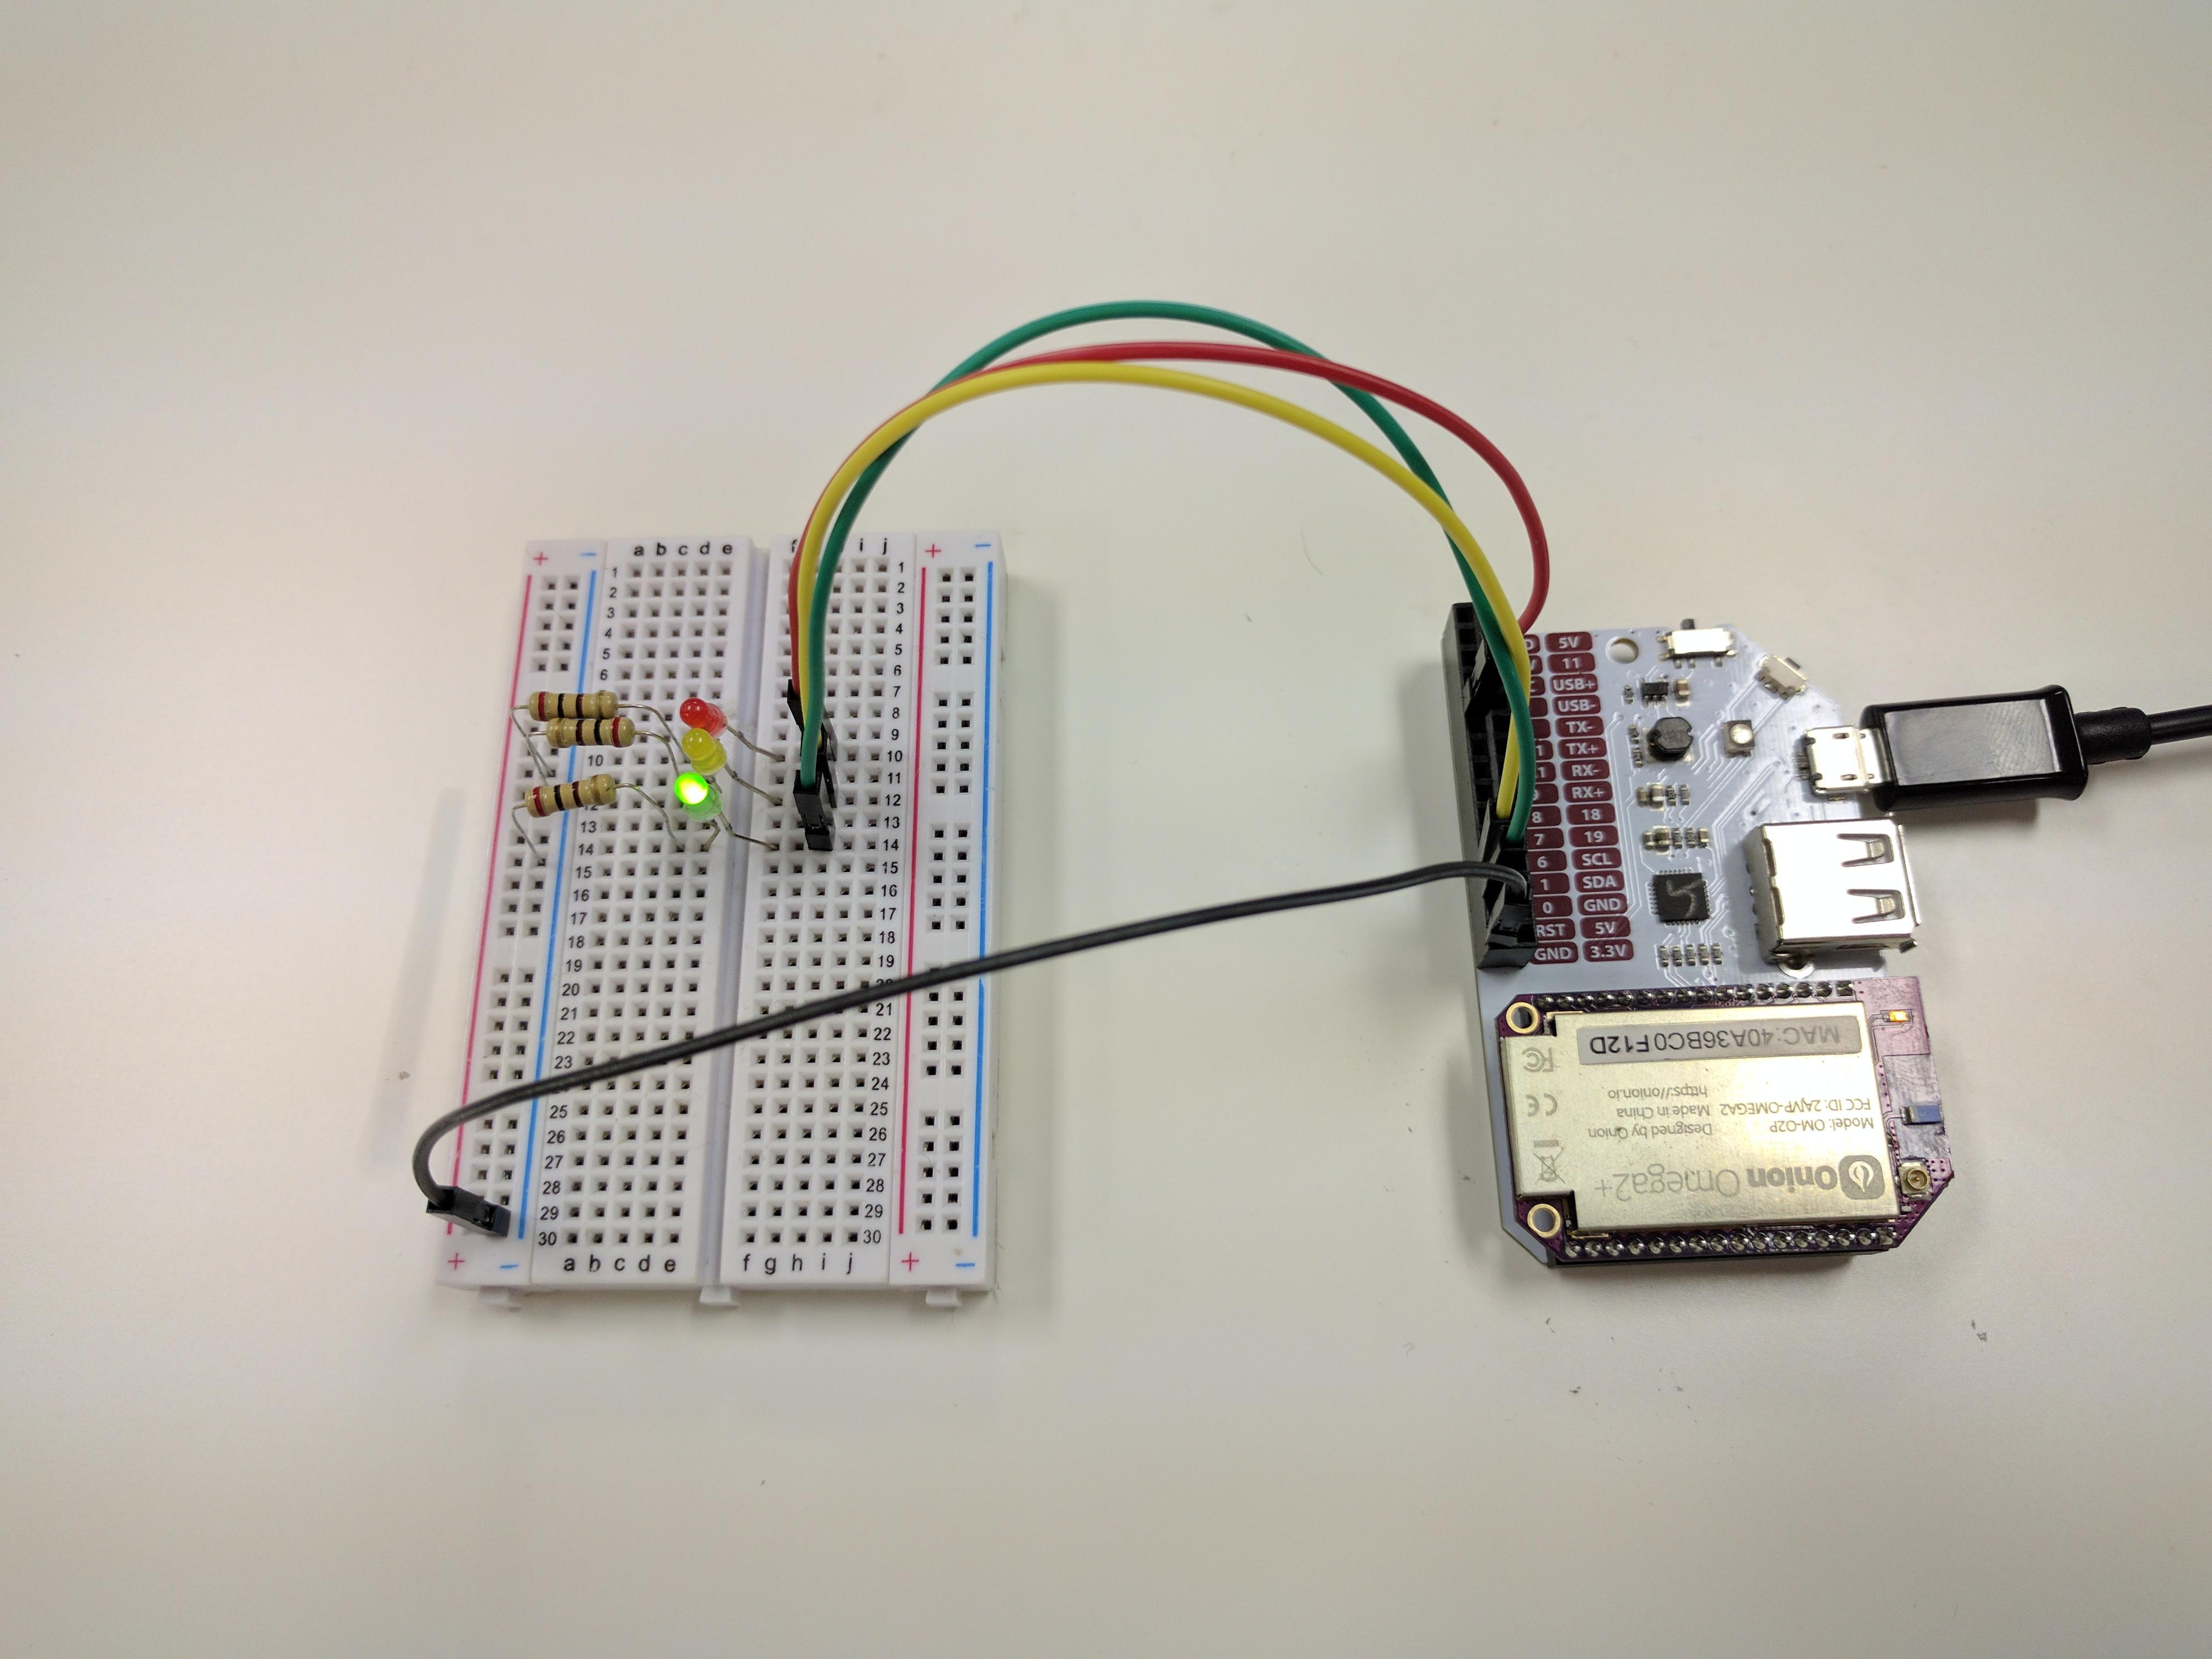 wiring diagram for honeywell thermostat rth2300 rth221 lifan lf 125 rth230b